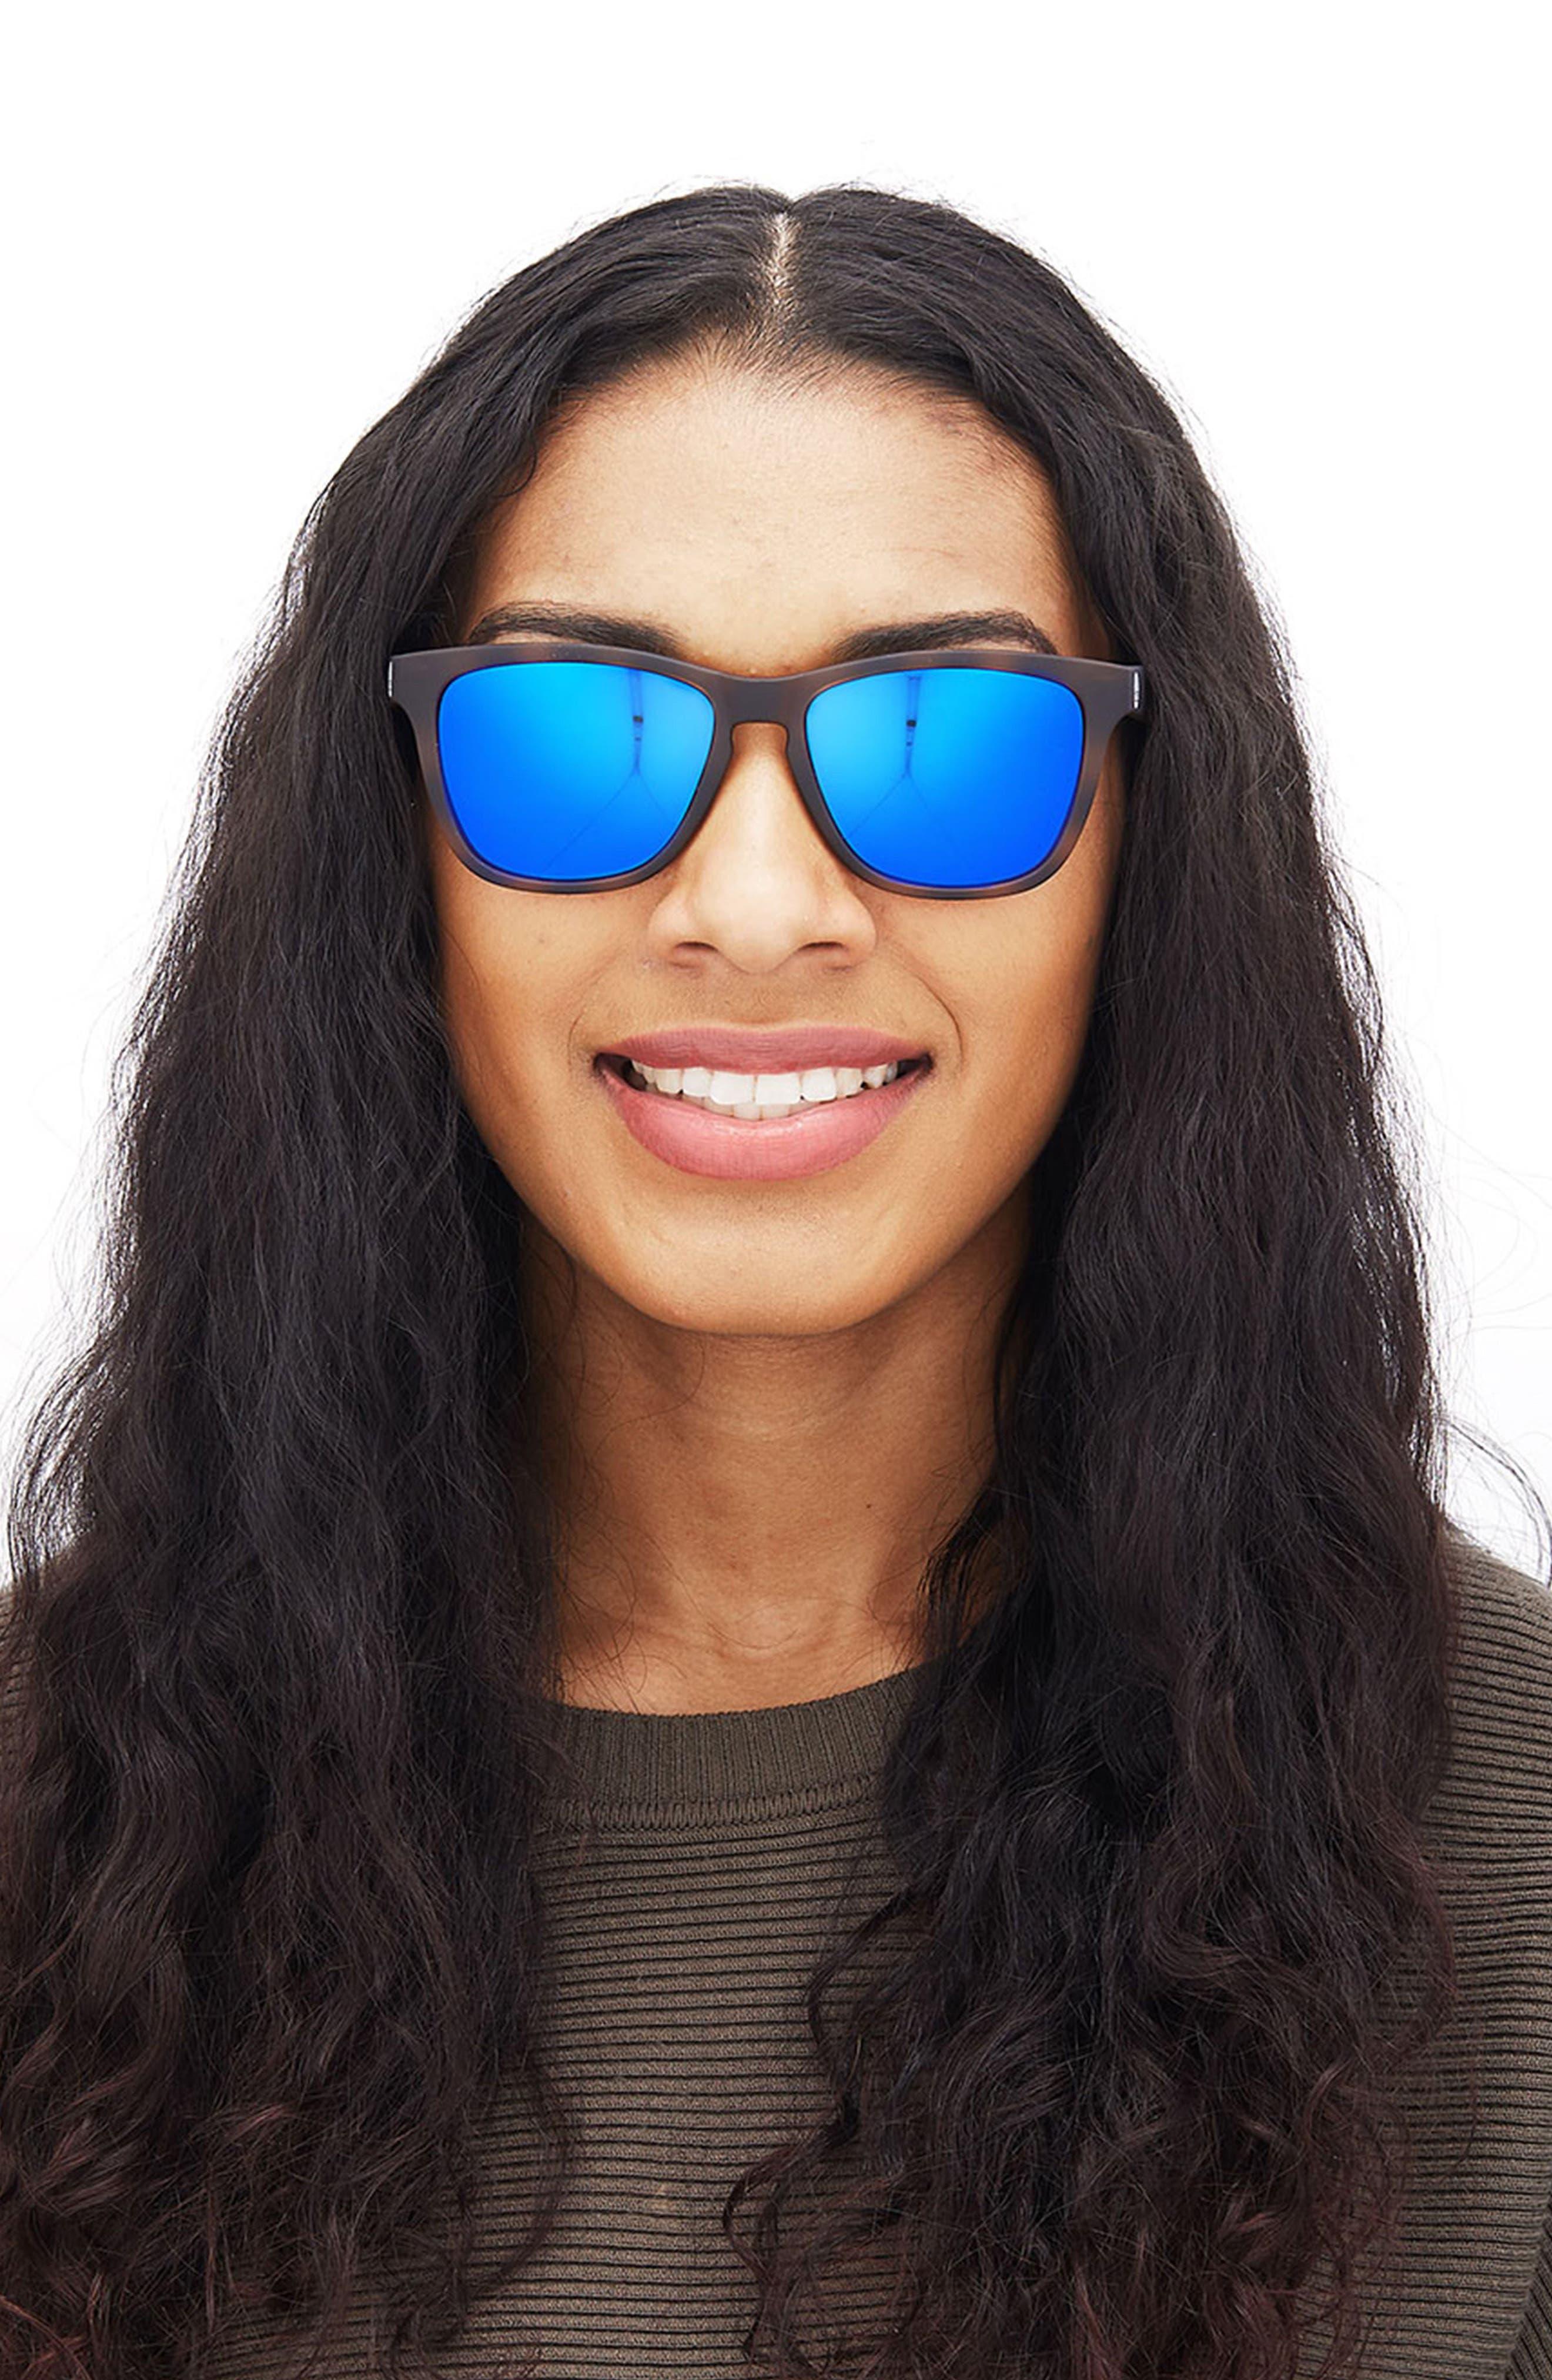 Madrona 53mm Polarized Sunglasses,                             Alternate thumbnail 5, color,                             TORTOISE/BLUE